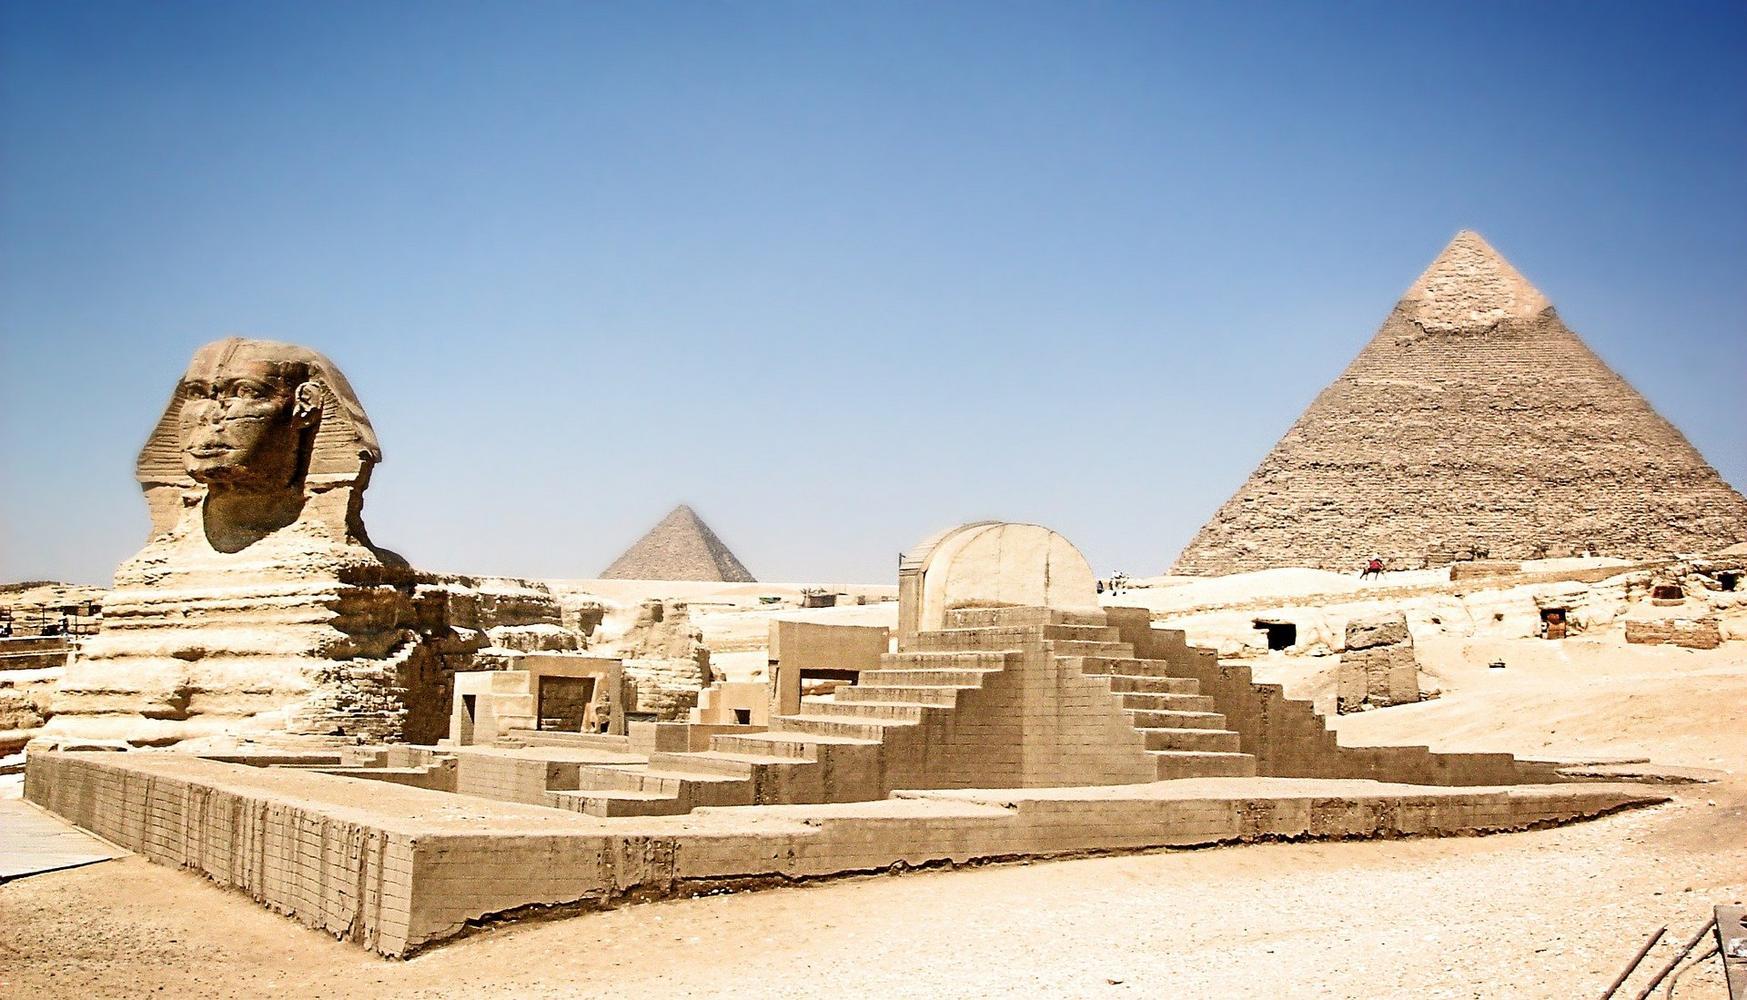 Giza necropolis - sphinx and pyramids, Cairo, Egypt